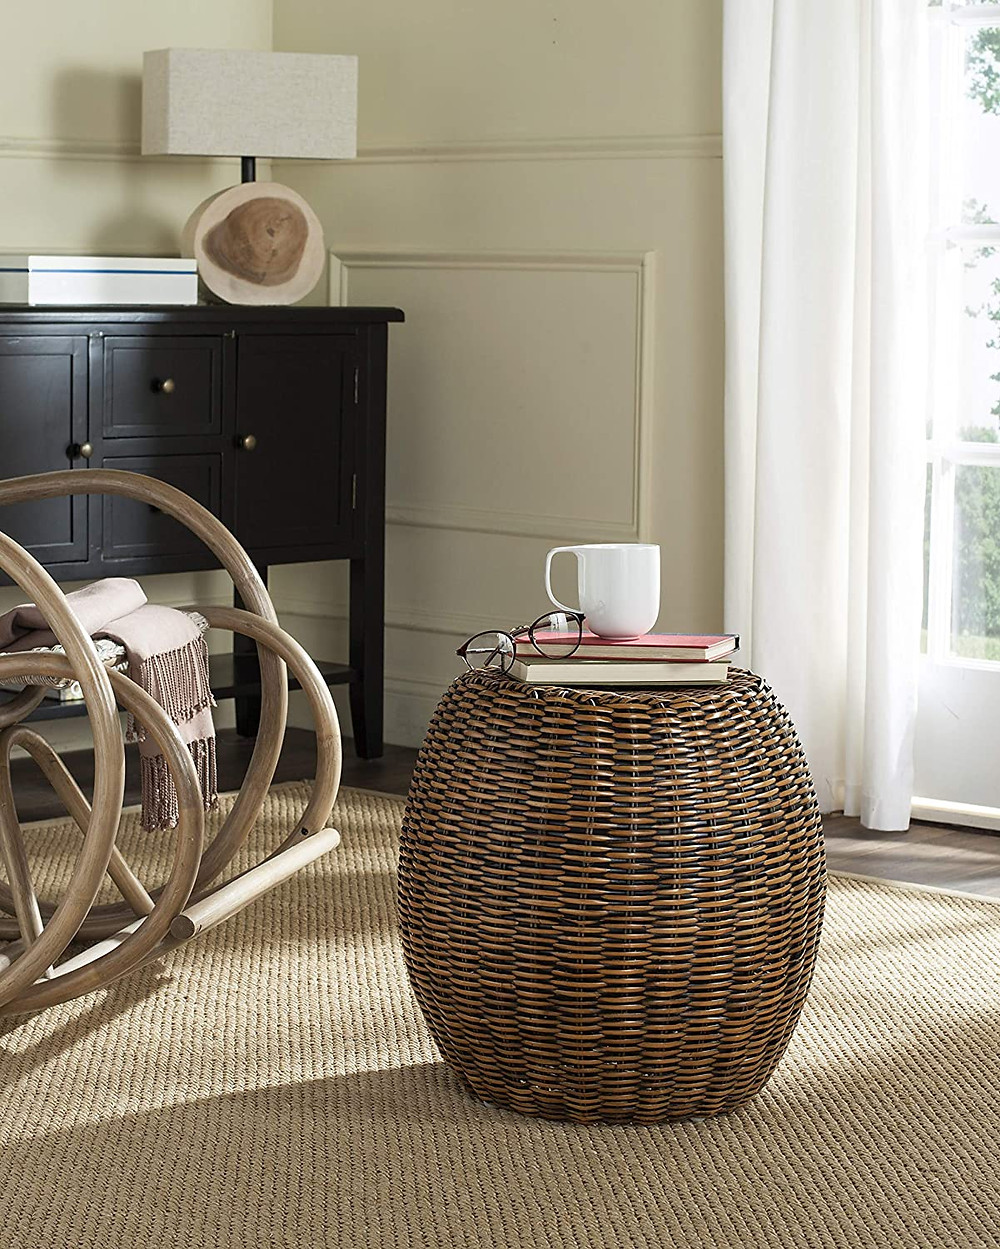 table, interior design, ratan table, living room, coffee table